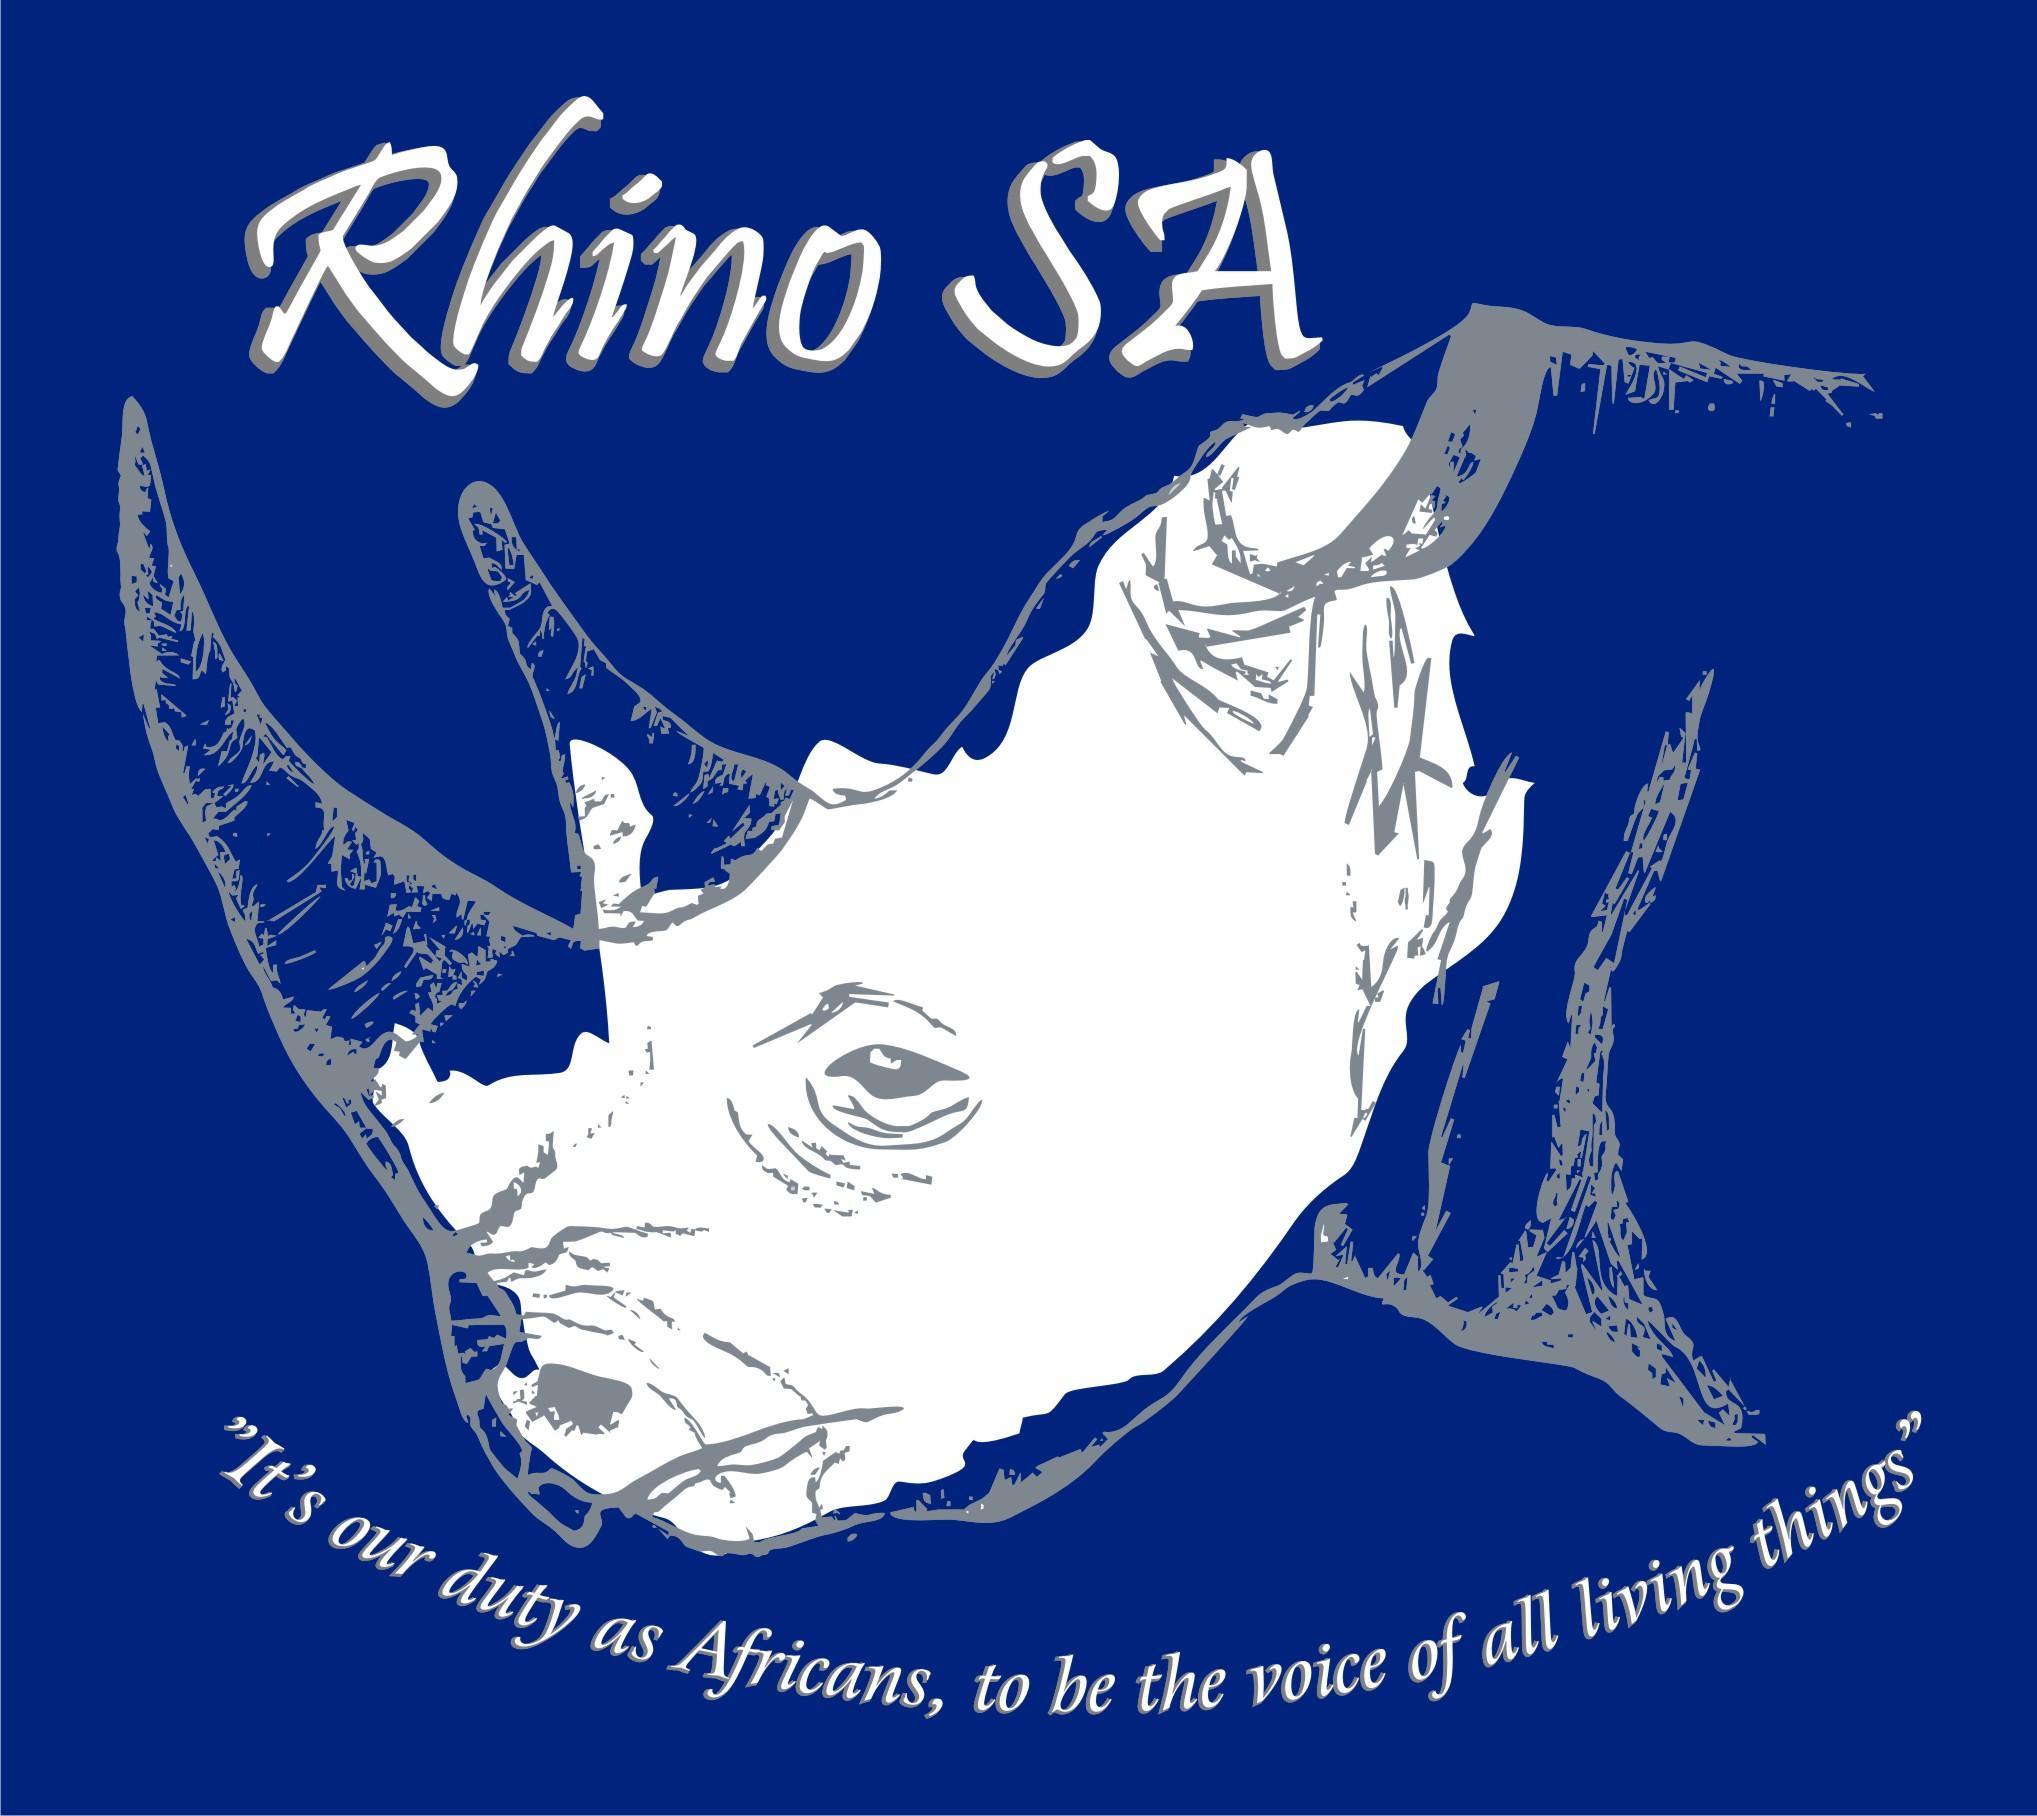 Republic Of South Africa President Jacob Zuma Rhino Poaching Pin By Danielle Morgan On Lofty Living Pinterest An Error Occurred